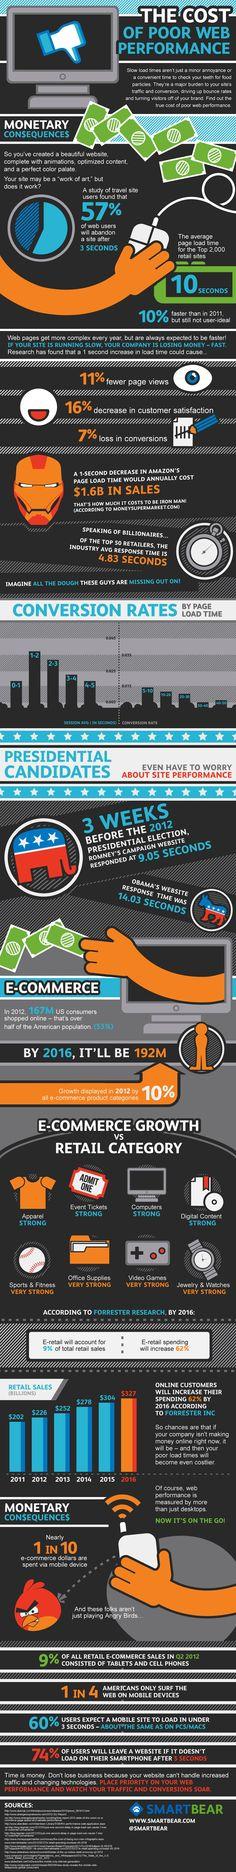 Slow webpage load costs Amazon 1.6 billion dollars in 1 second delay.  A bit hard to believe huh @smartbear